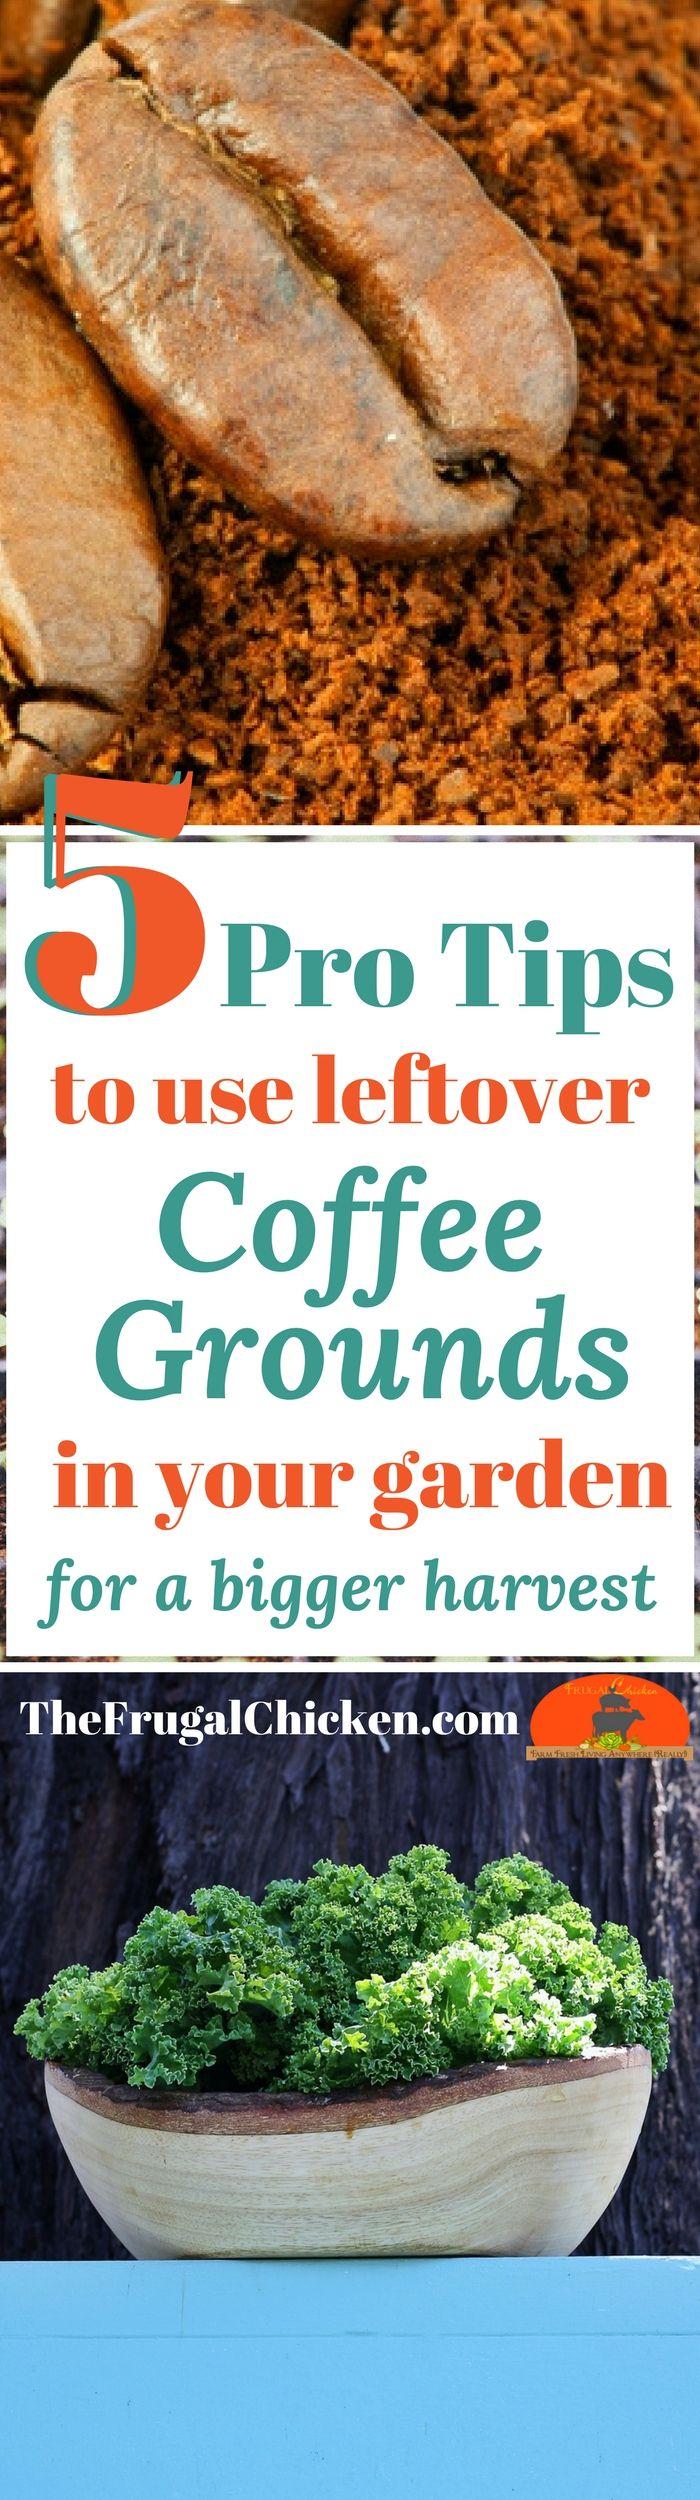 24677 Best Hometalk Gardening Images On Pinterest Gardening Vegetable Garden And Vegetables